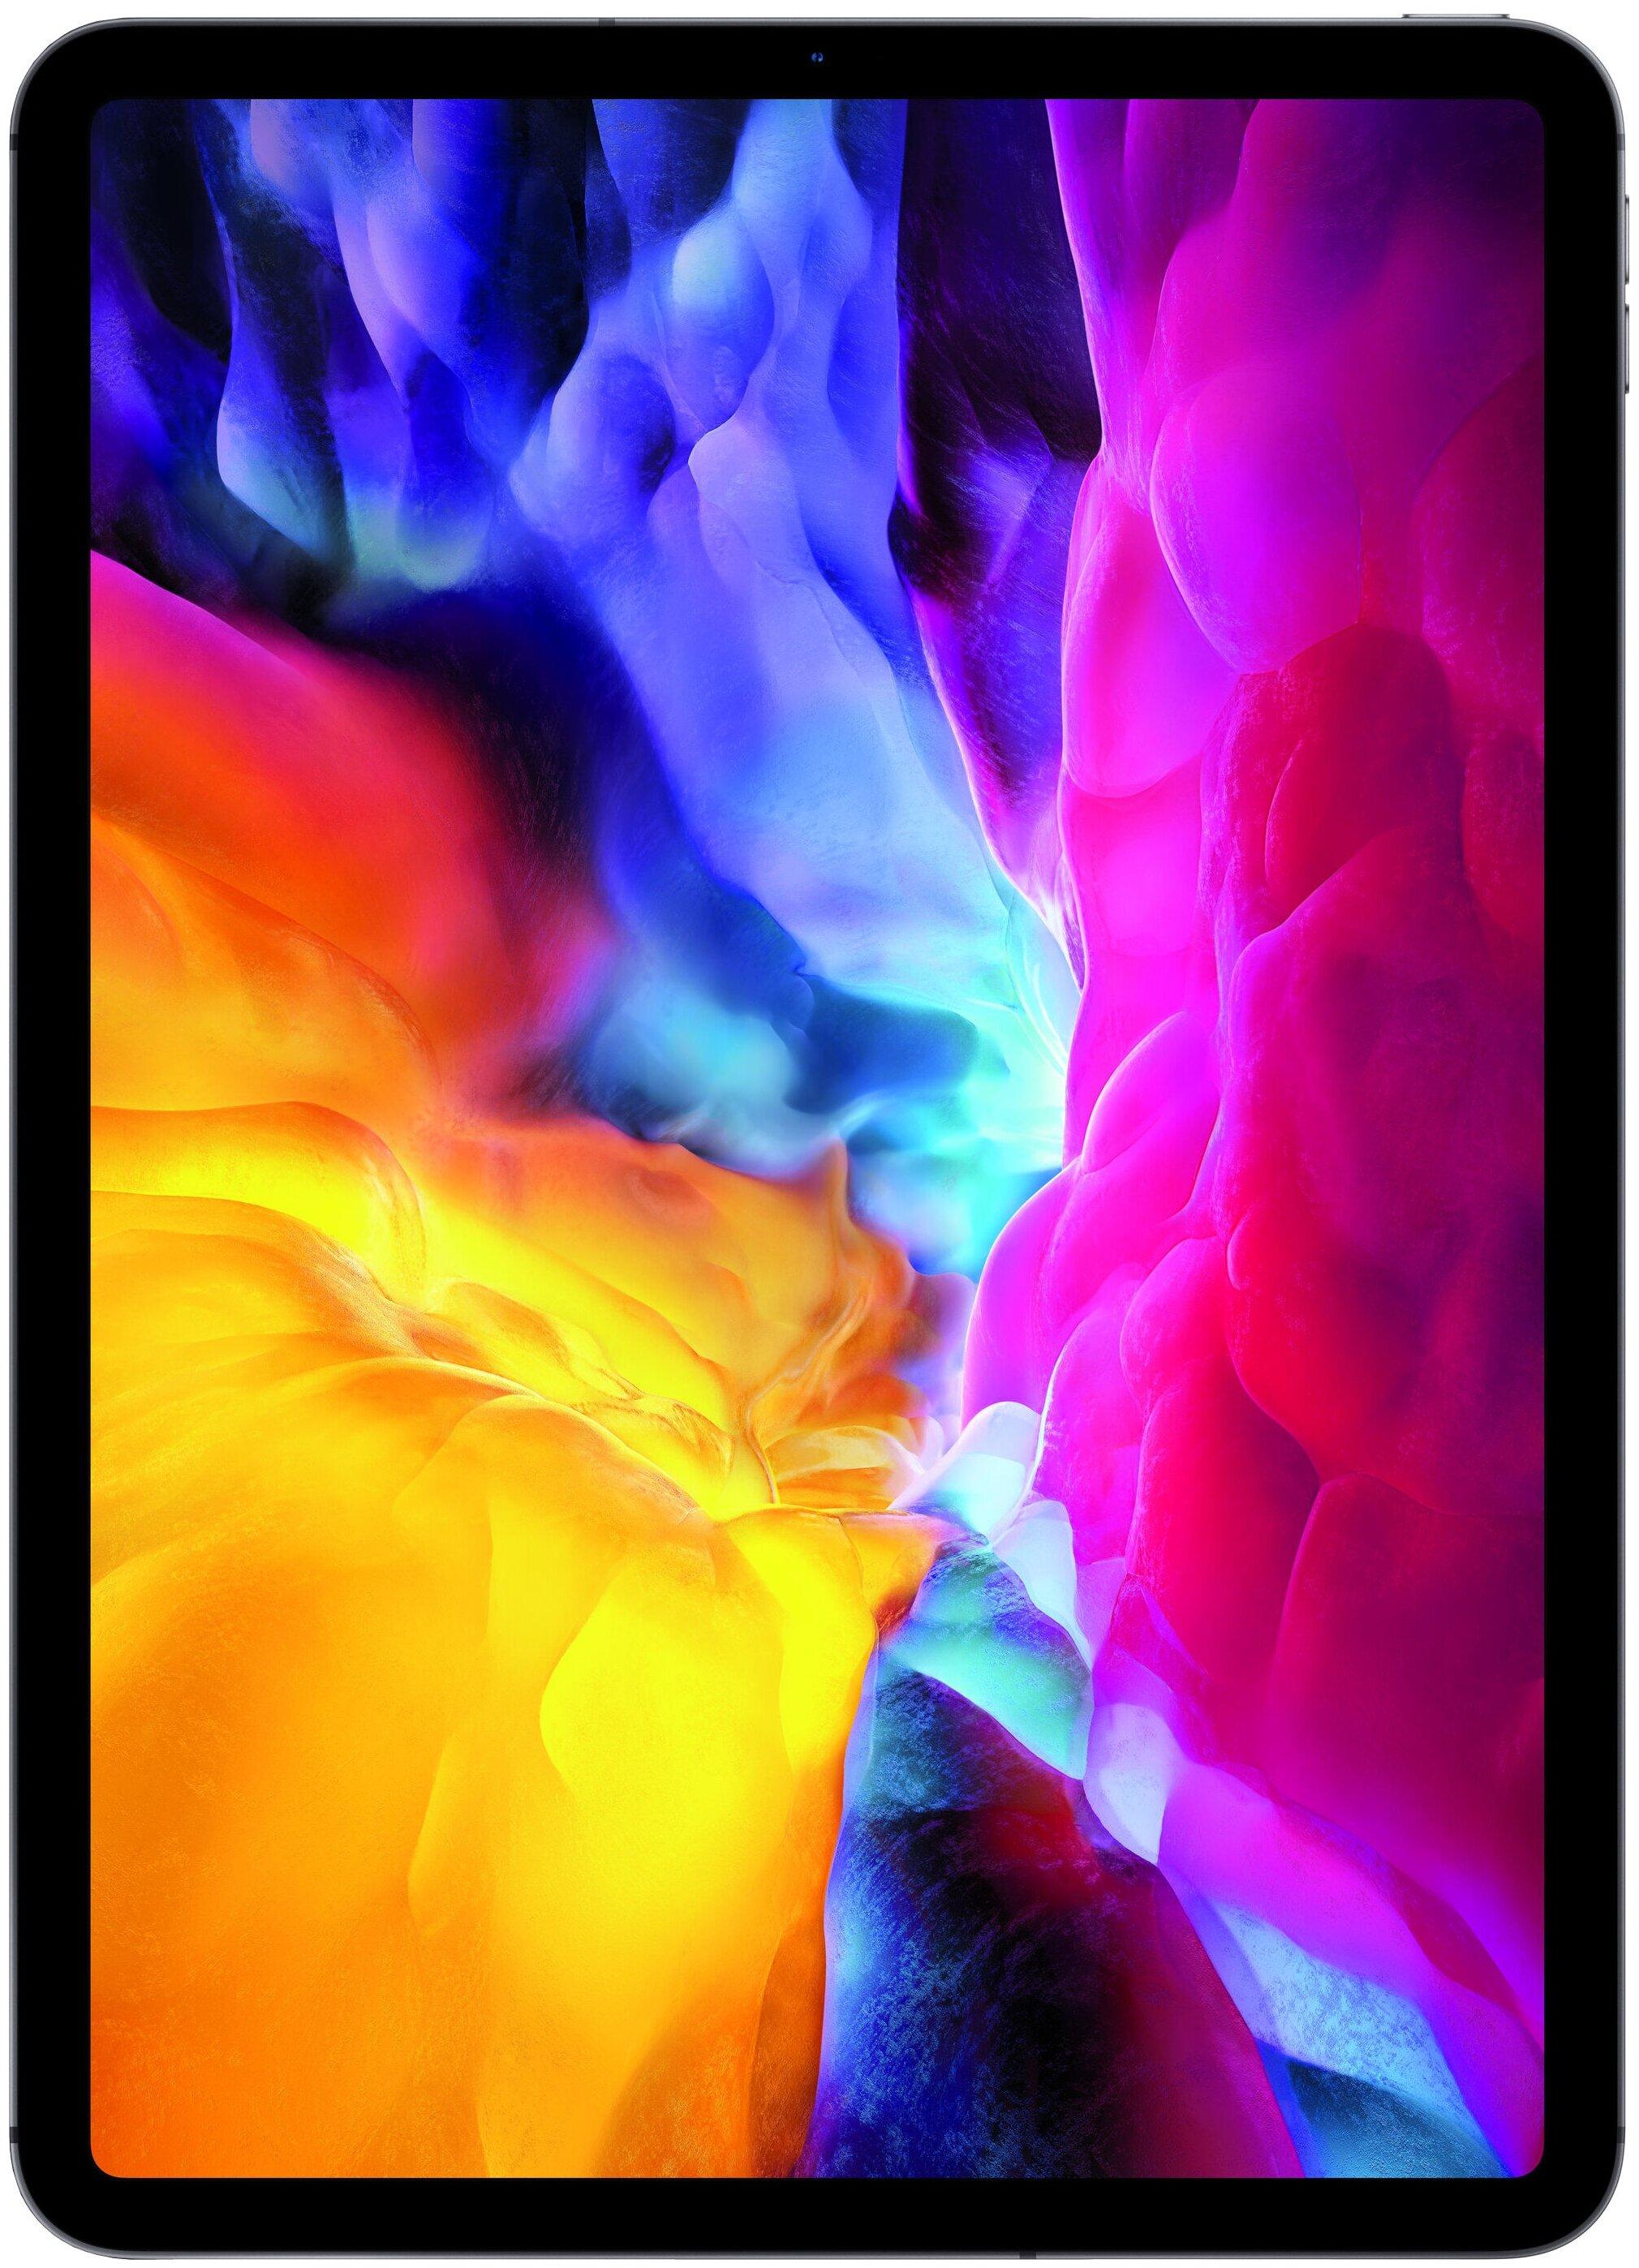 Apple iPad Pro 11 (2020) 128Gb Wi-Fi - операционная система: iOS